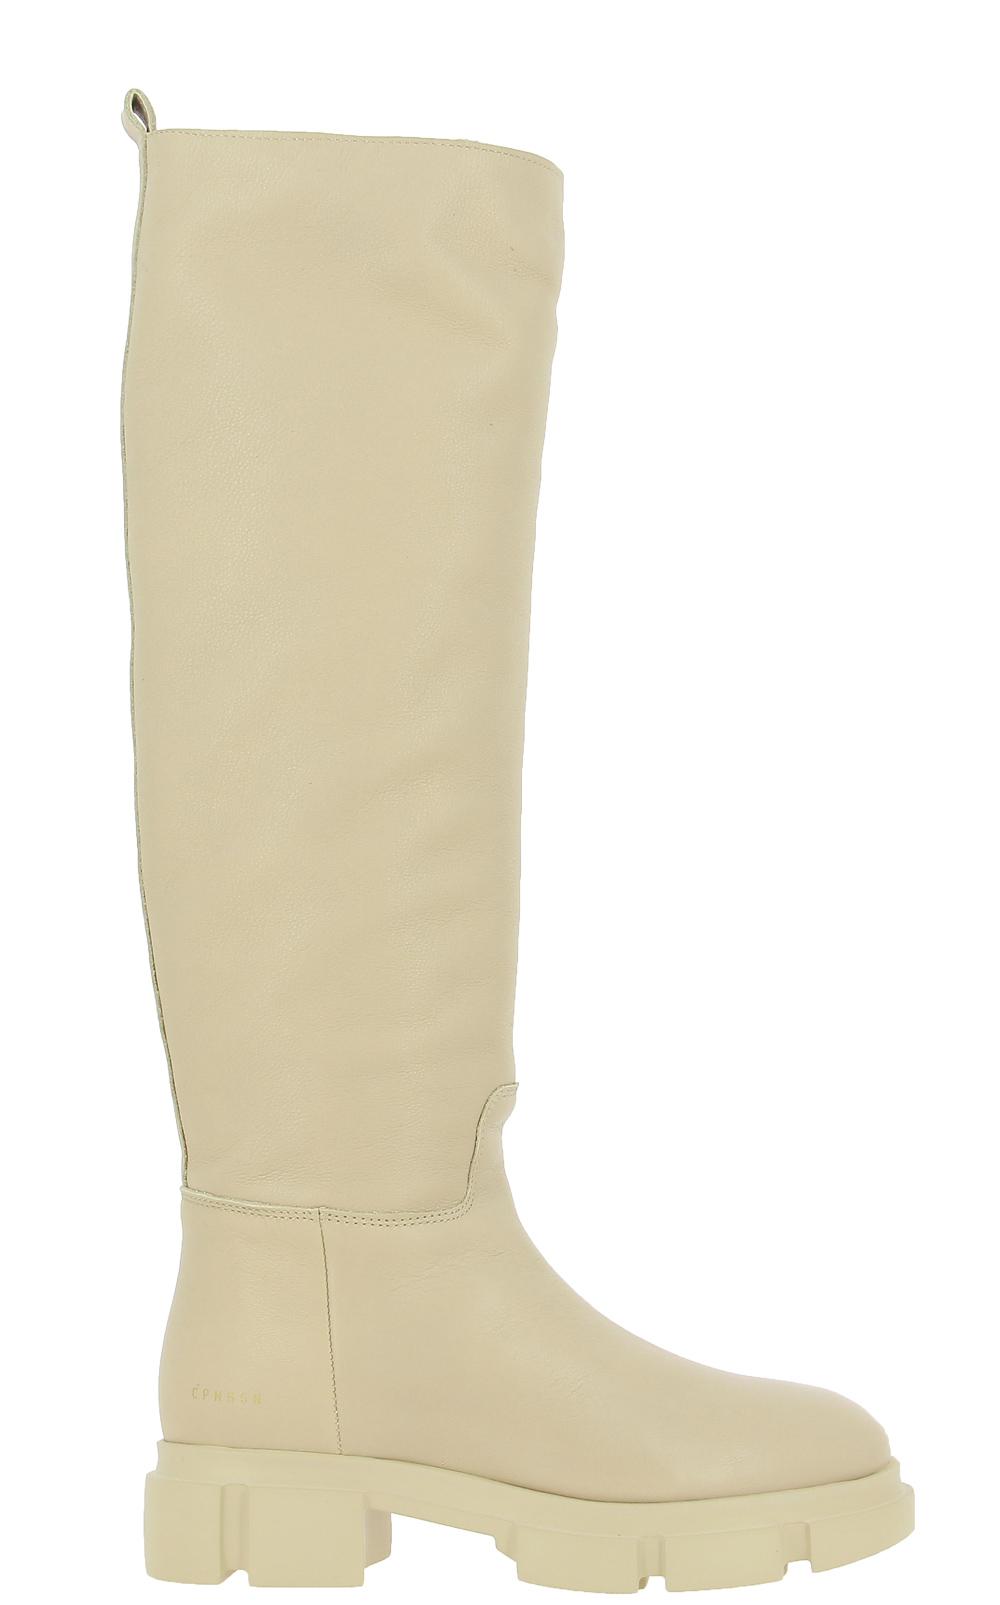 Copenhagen stretch boots CPH551 VITELLO NATURE